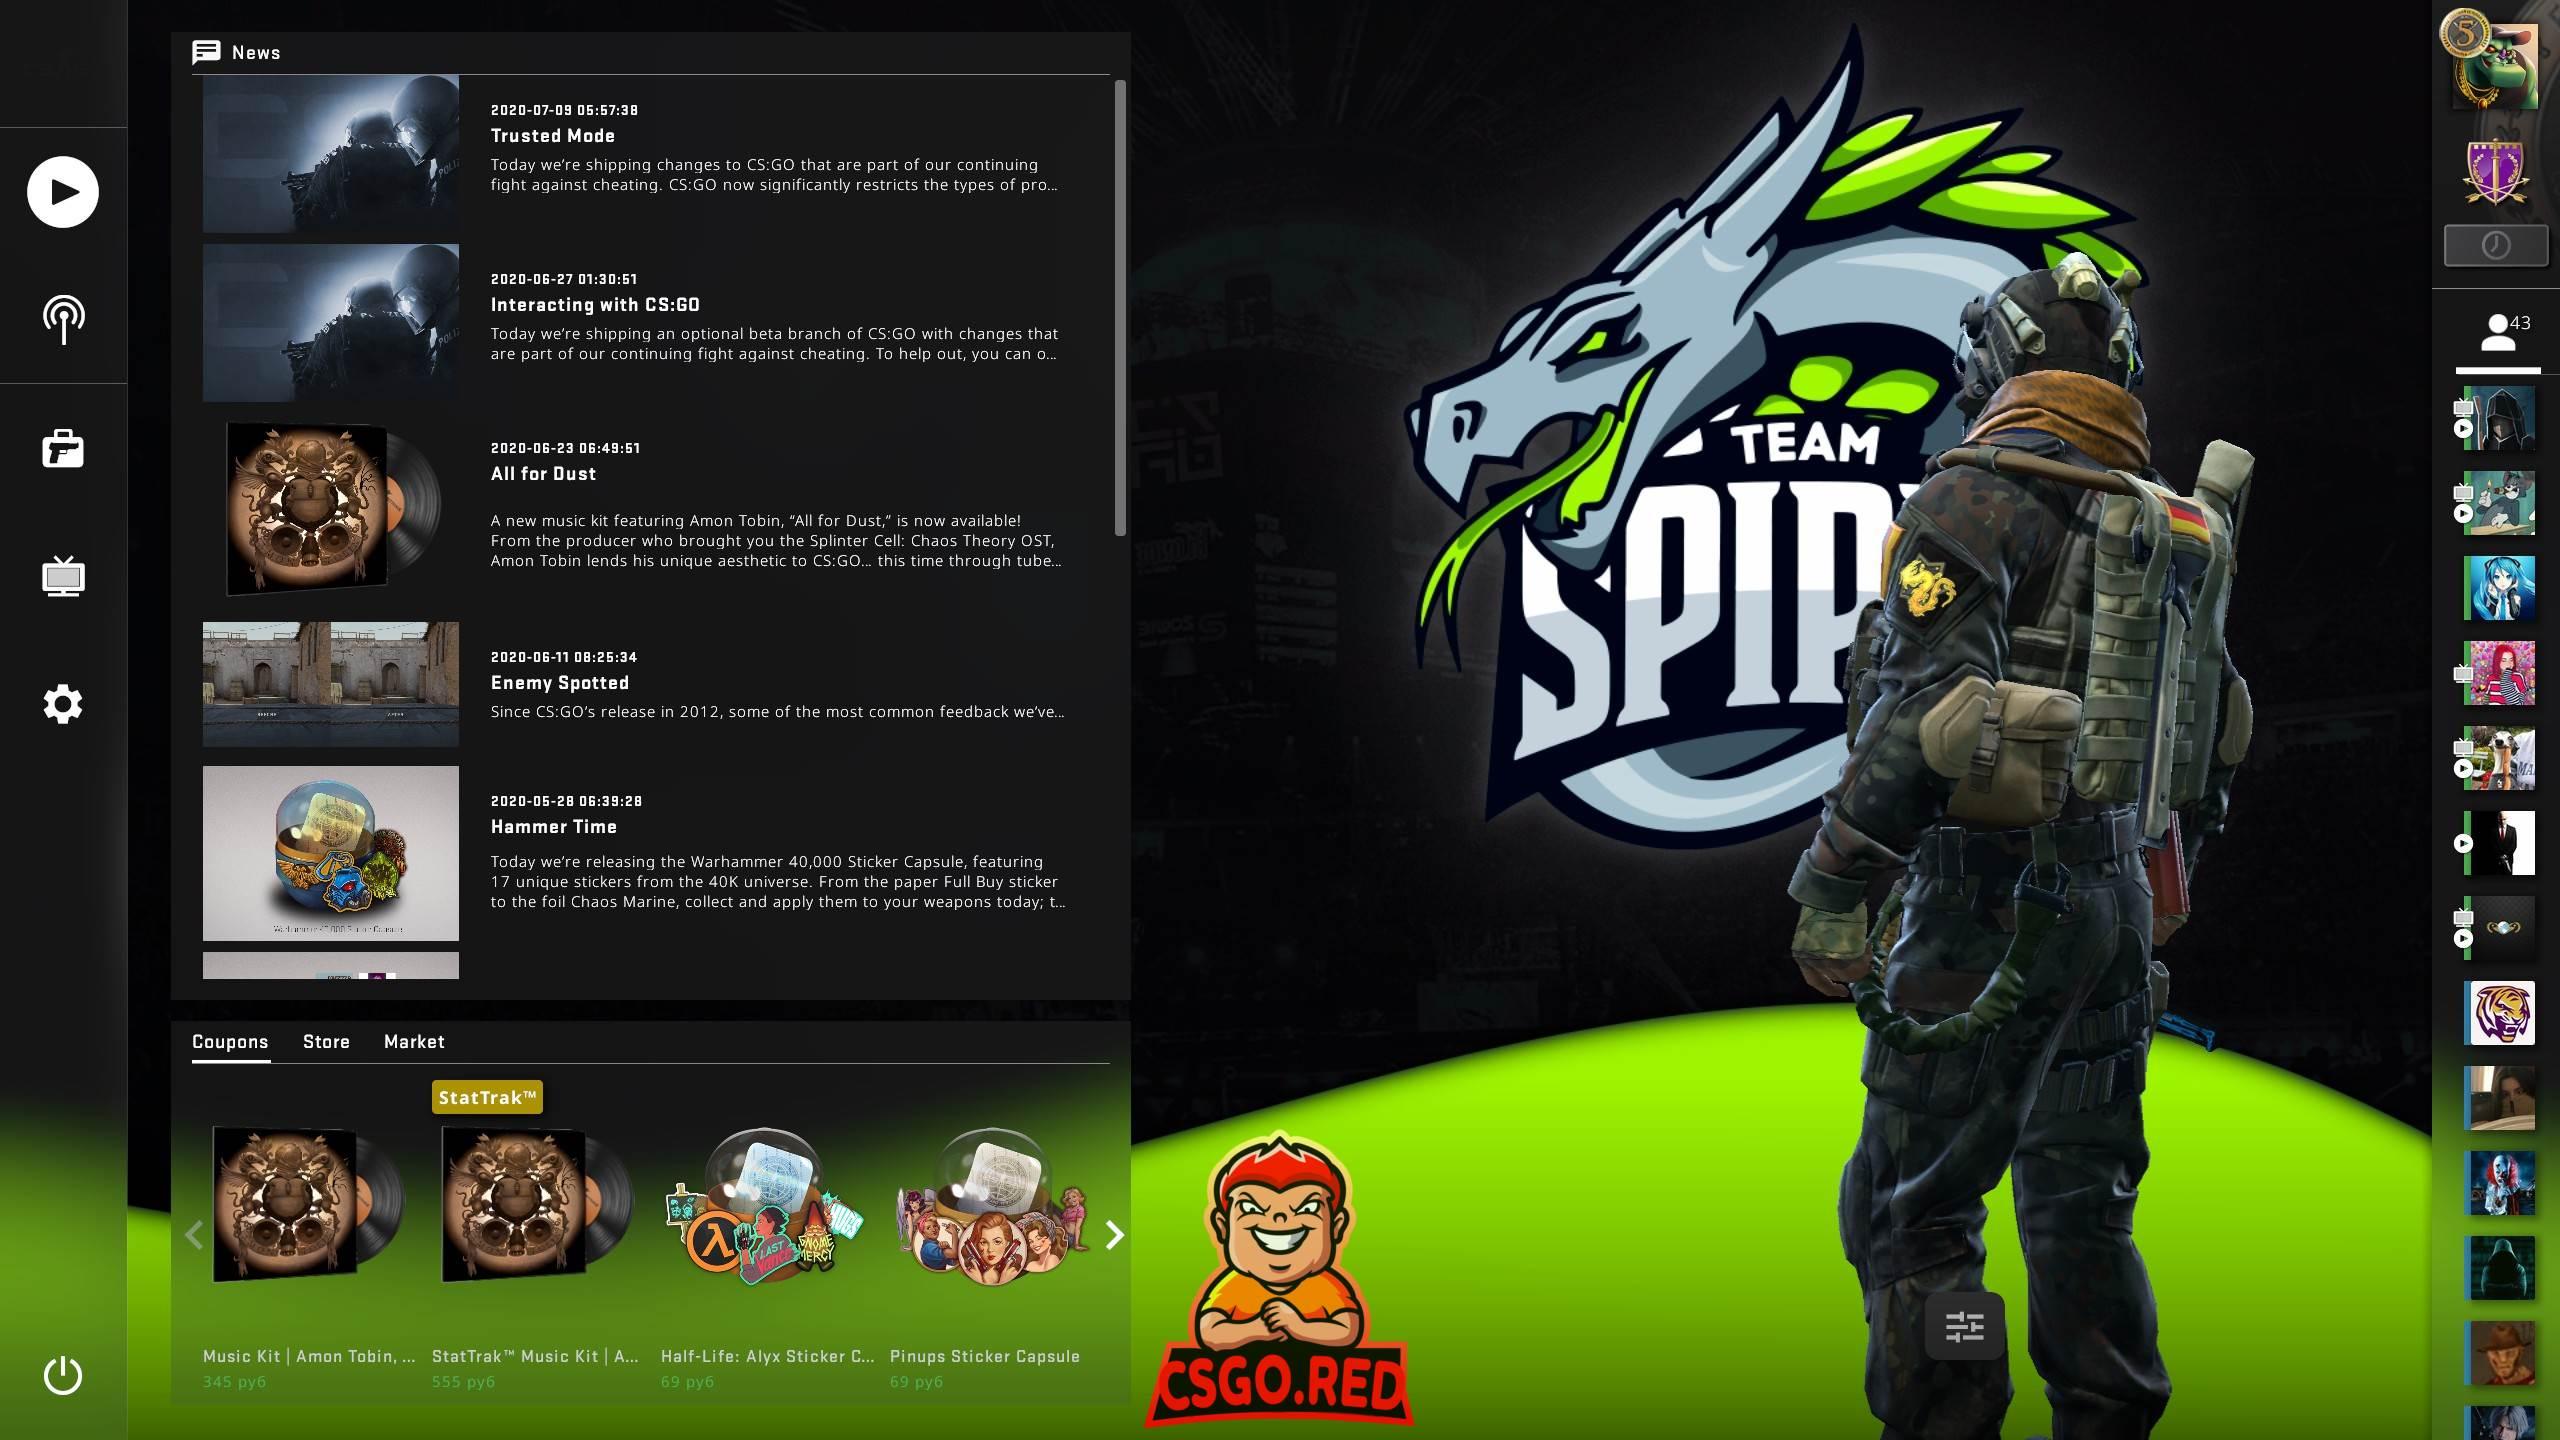 Team Spirit Panorama UI Background